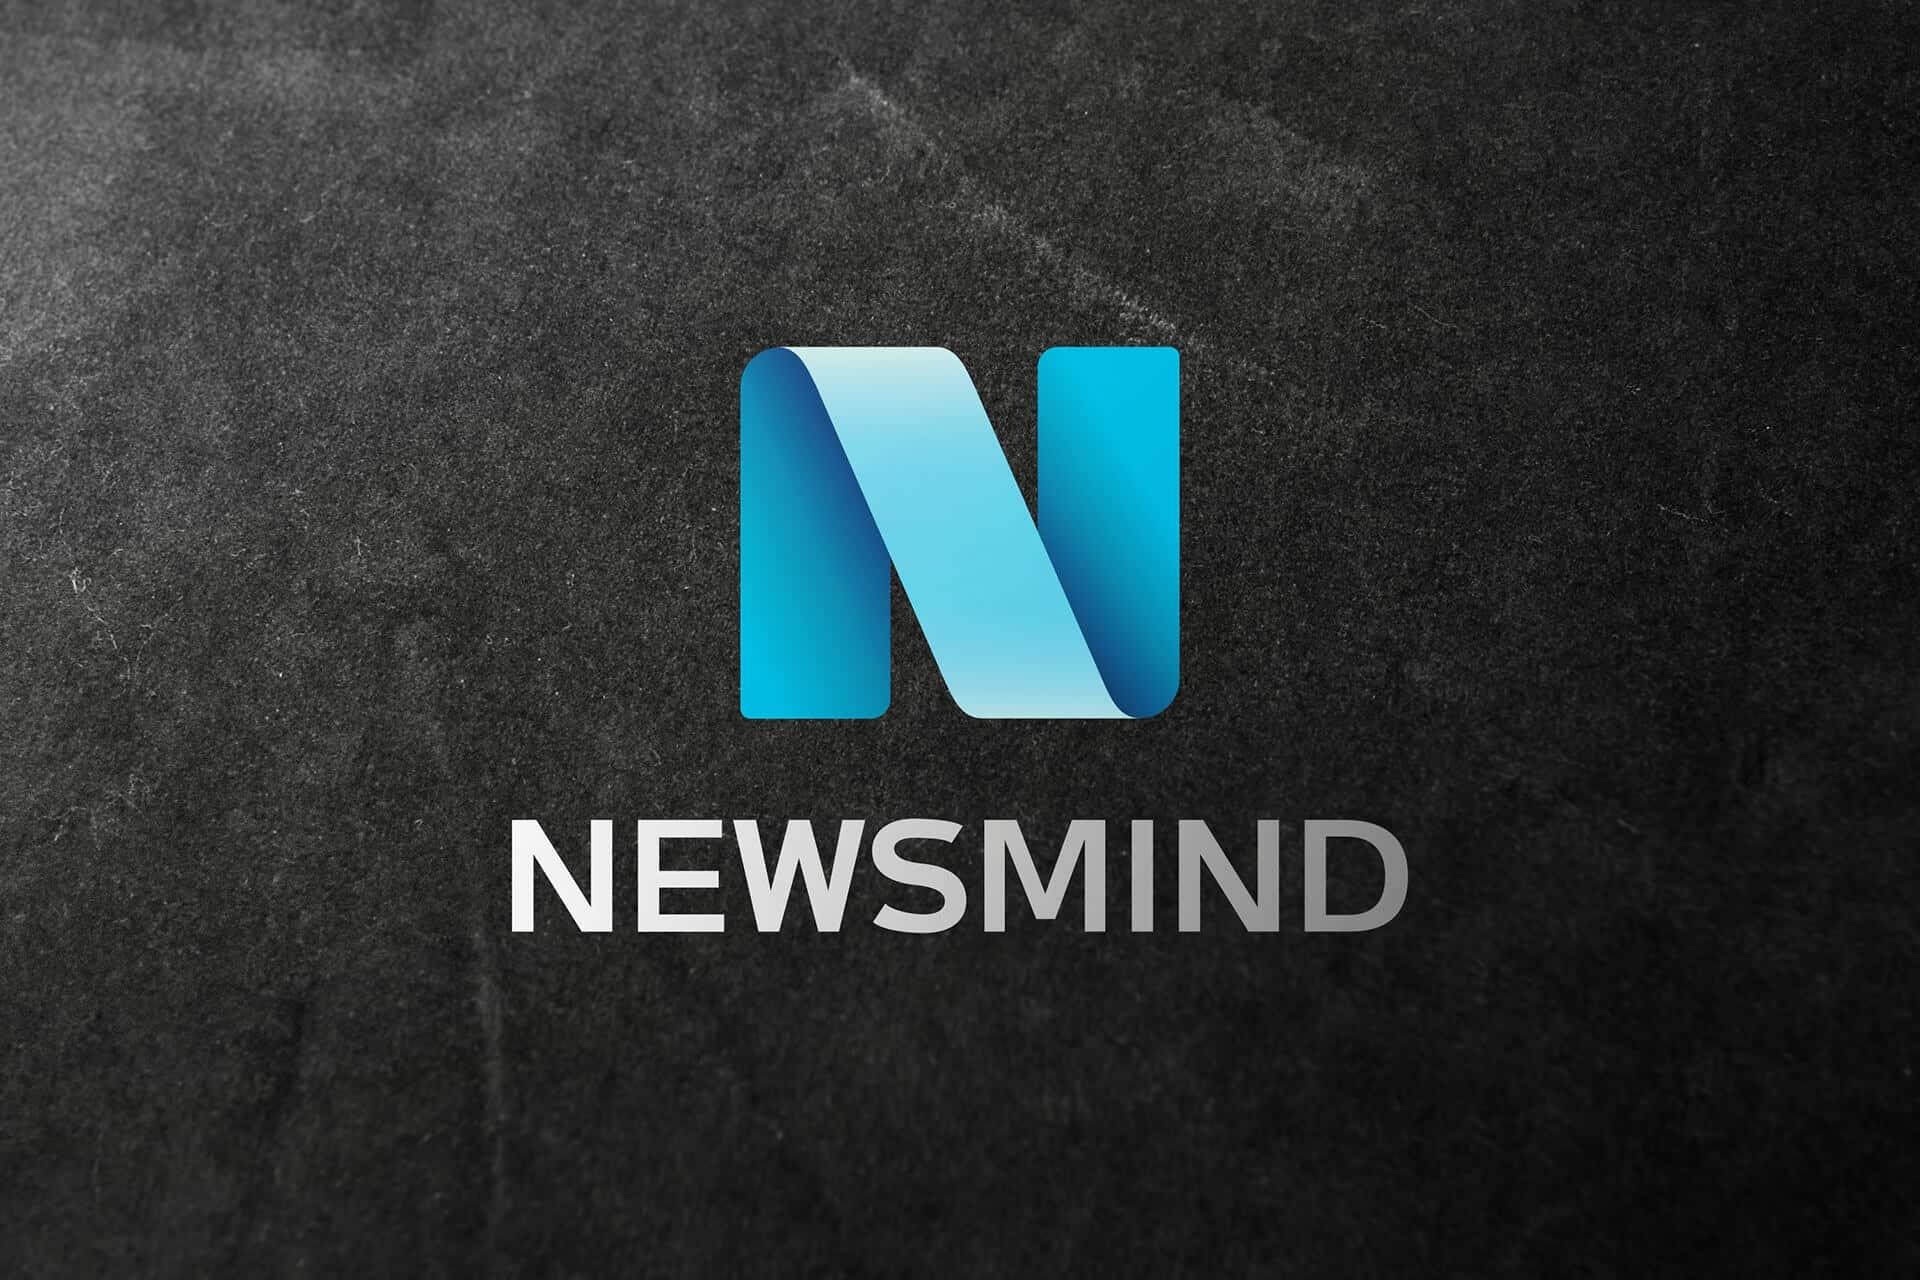 Convit launcht Newsmind Produktportfolio